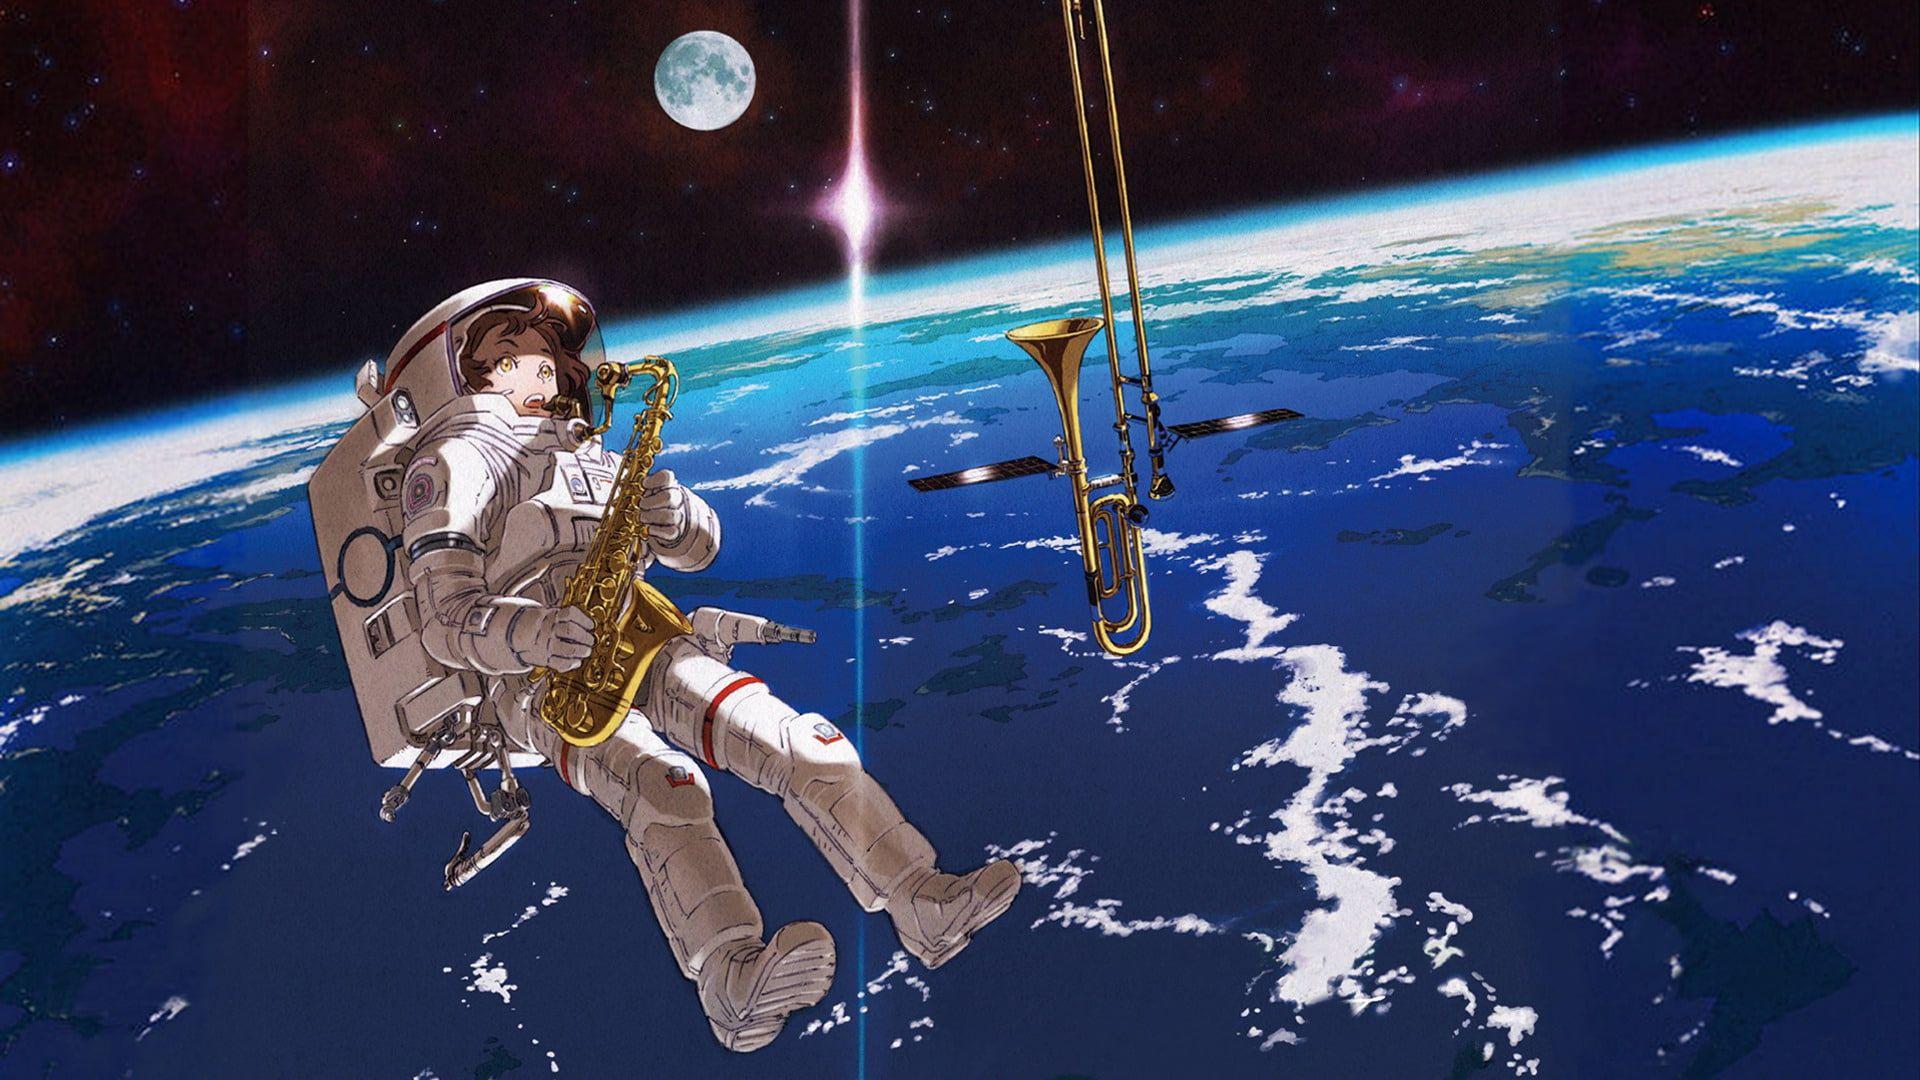 Anime Music Platina Jazz 1080p Wallpaper Hdwallpaper Desktop Hd Wallpaper Wallpaper Anime Anime music desktop wallpaper